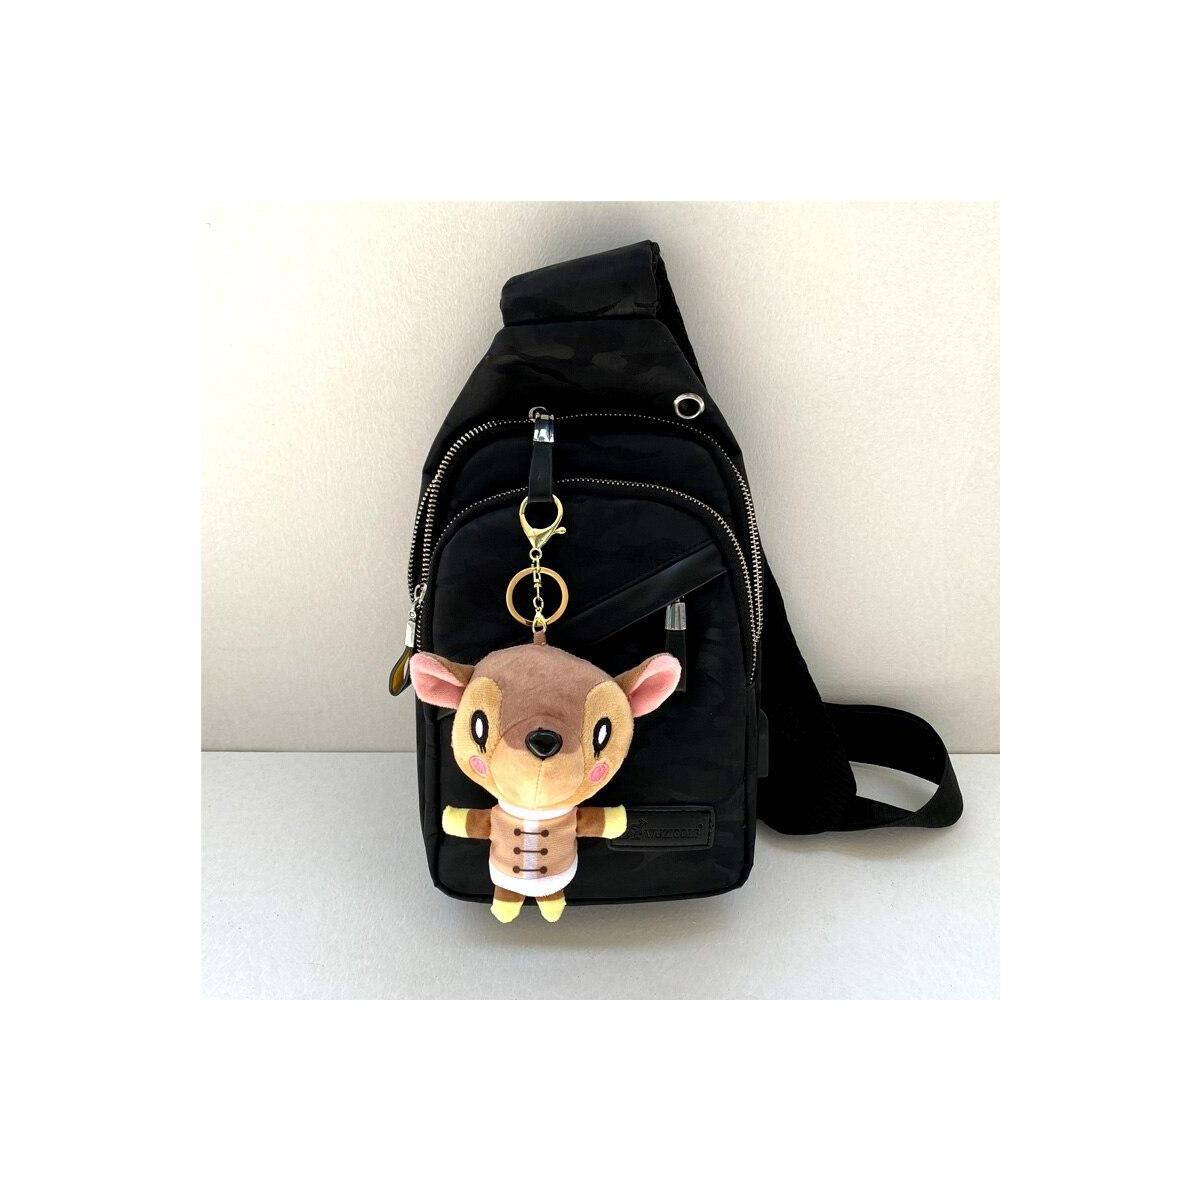 Animal Crossing Plush Villager Keychains, 12cm-celeste